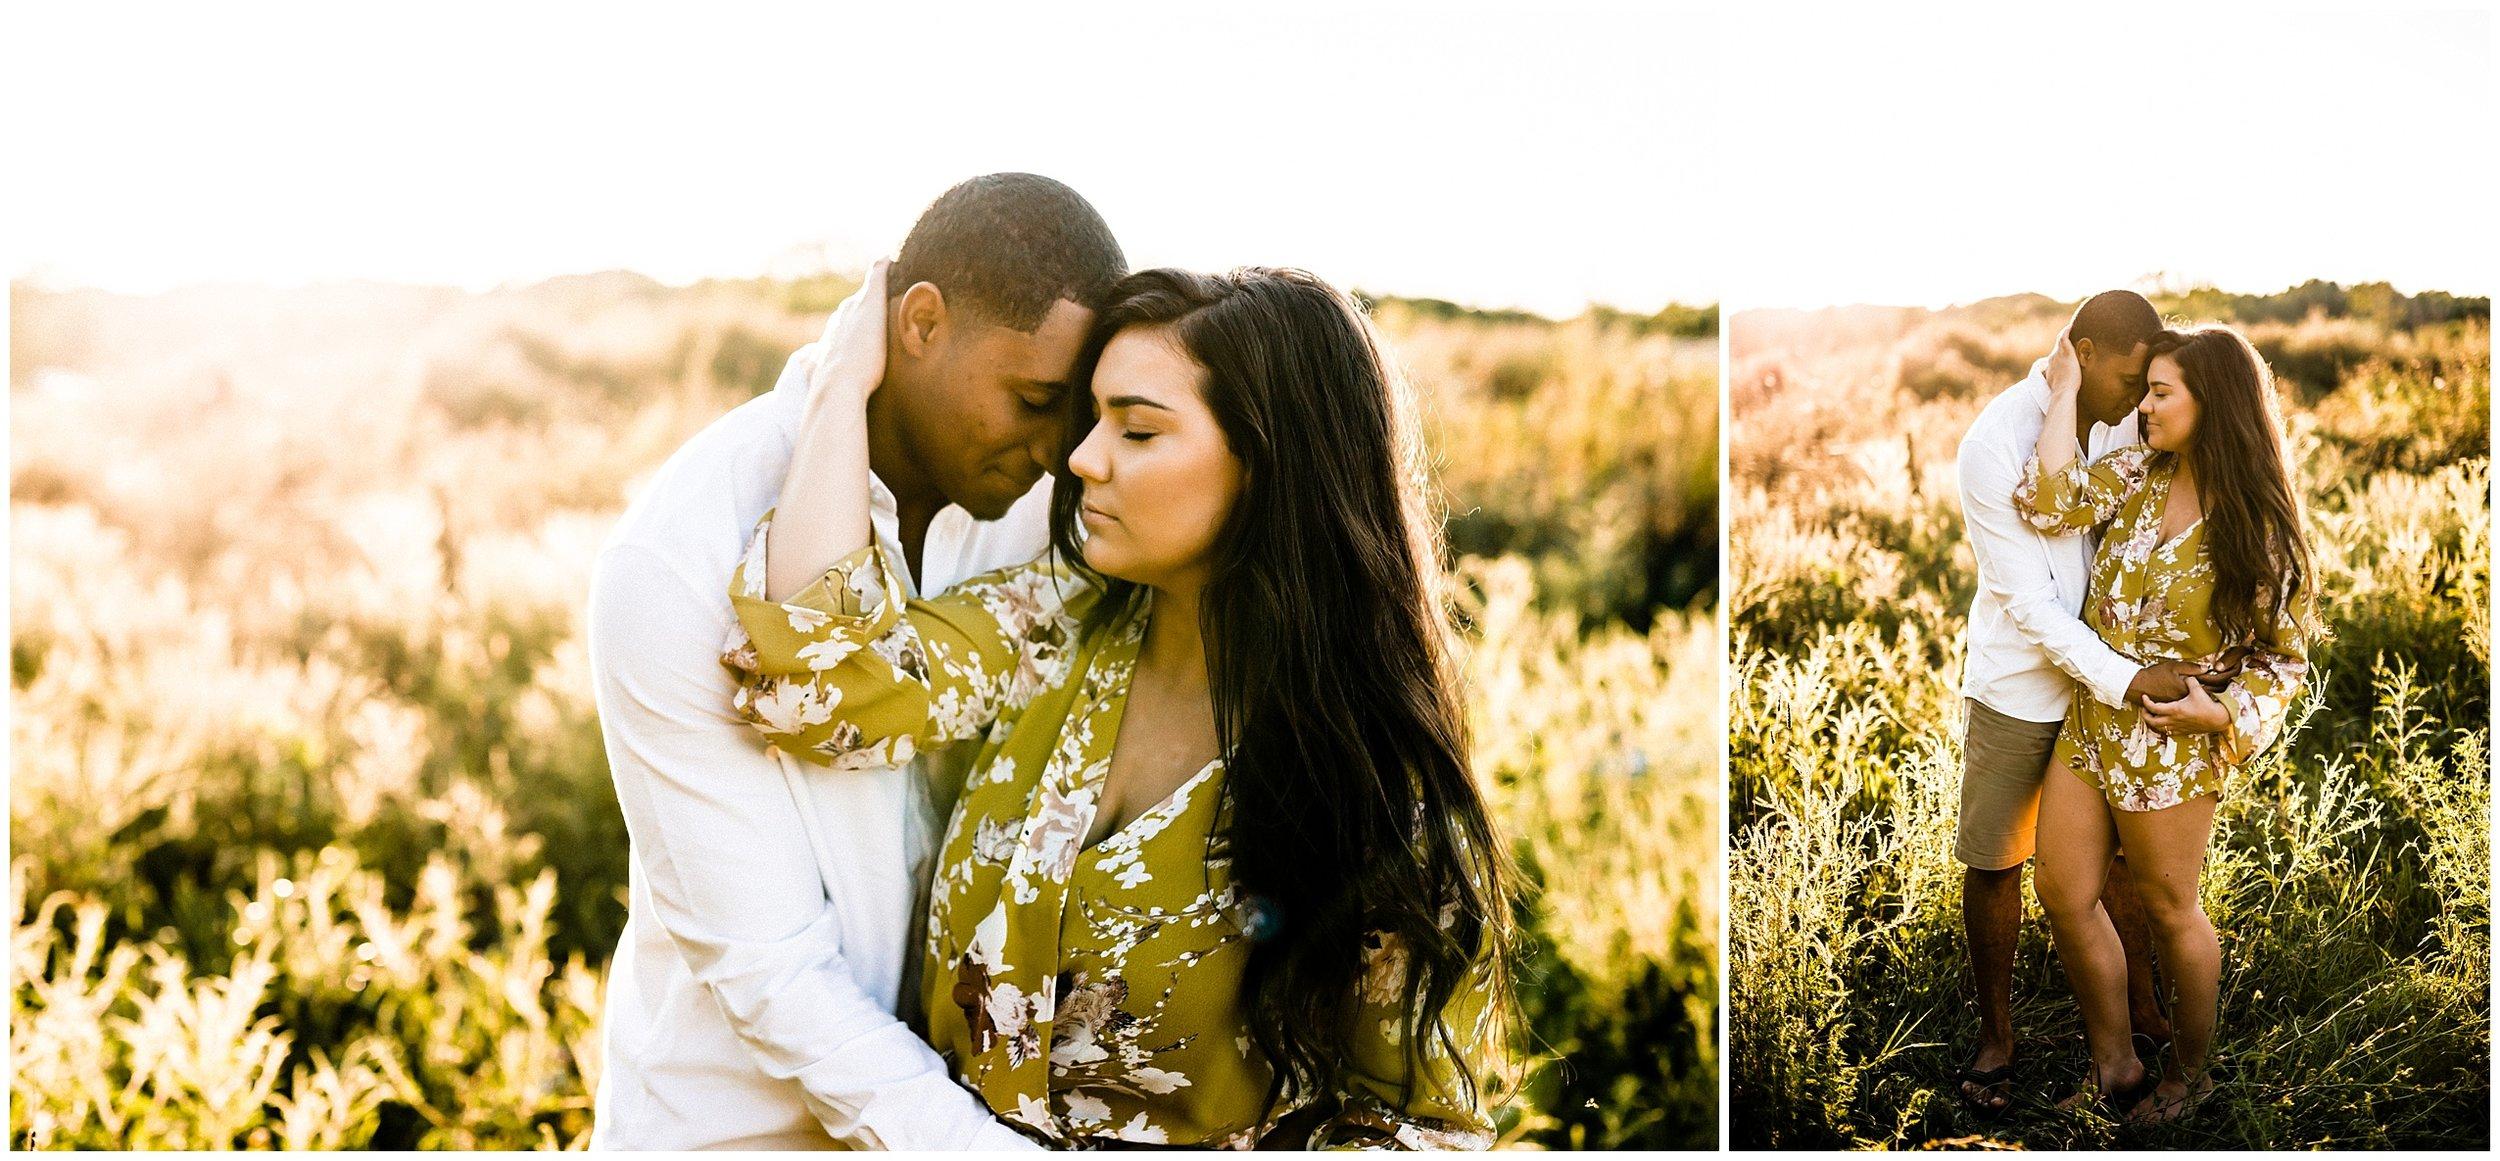 Tabias + Zabrea | Engaged  #kyleepaigephotography_0672.jpg